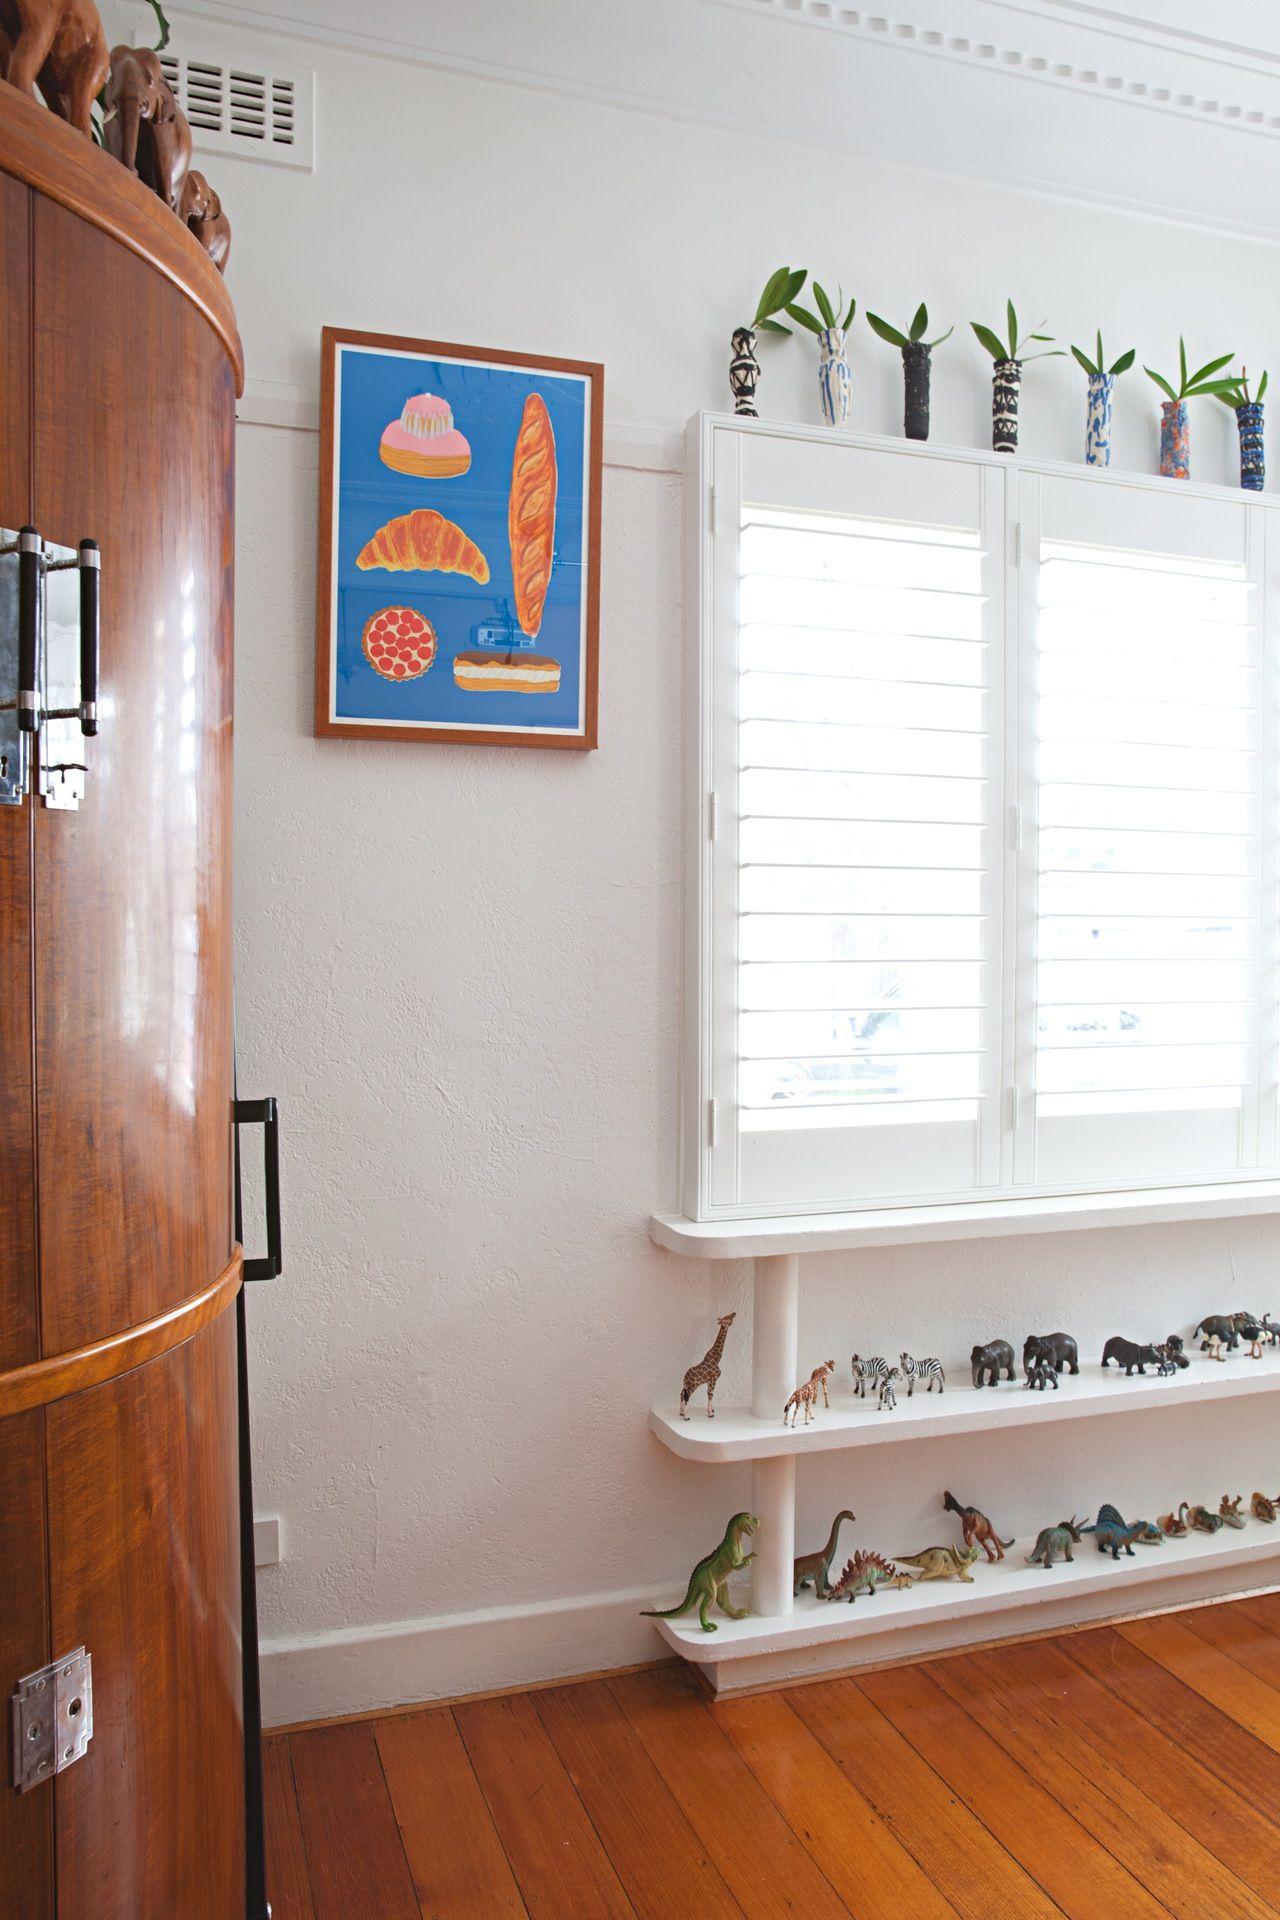 House Tour: An Art Deco, Art-Filled Australian Home   Apartment ...